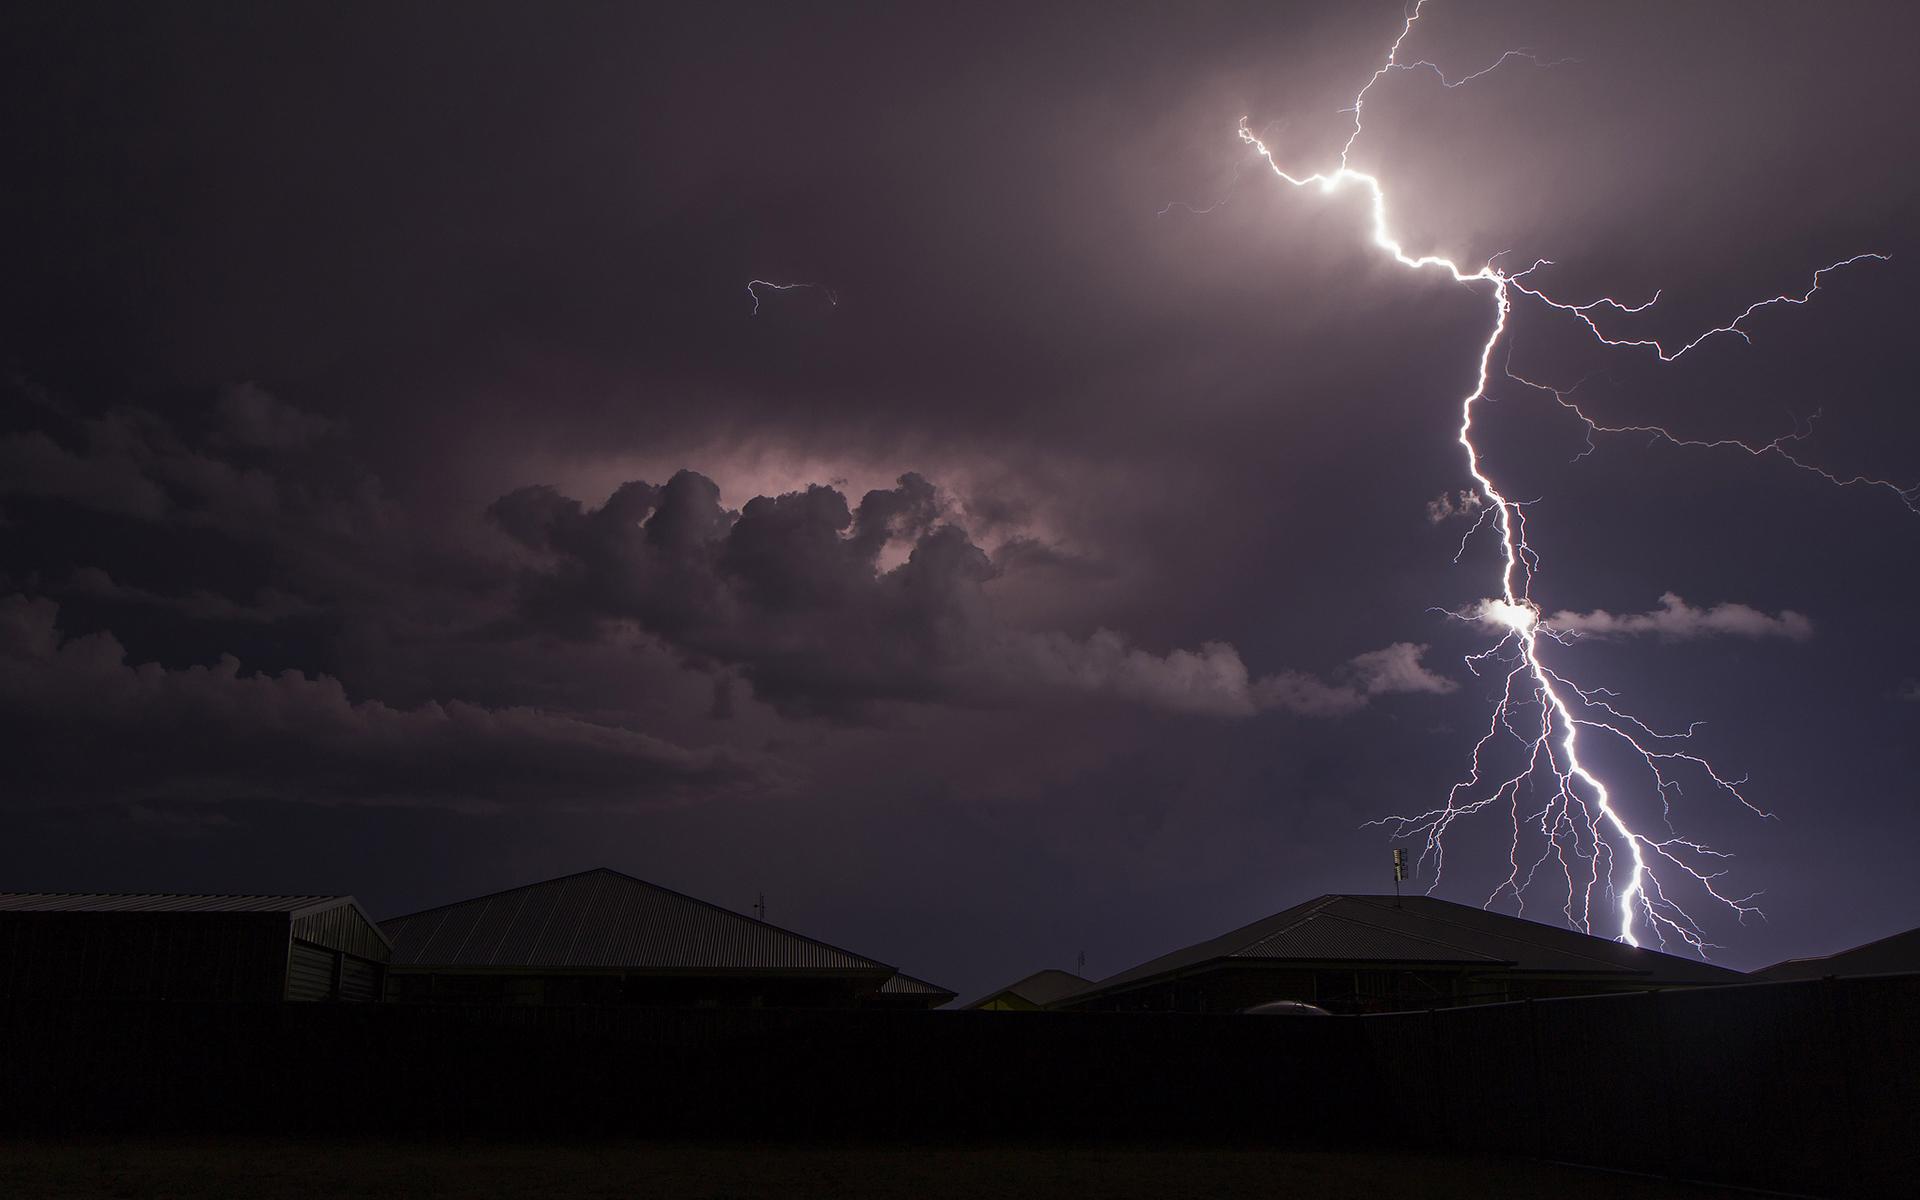 Free Mobile Fall Wallpapers Free Download Lightning Storm Backgrounds Pixelstalk Net